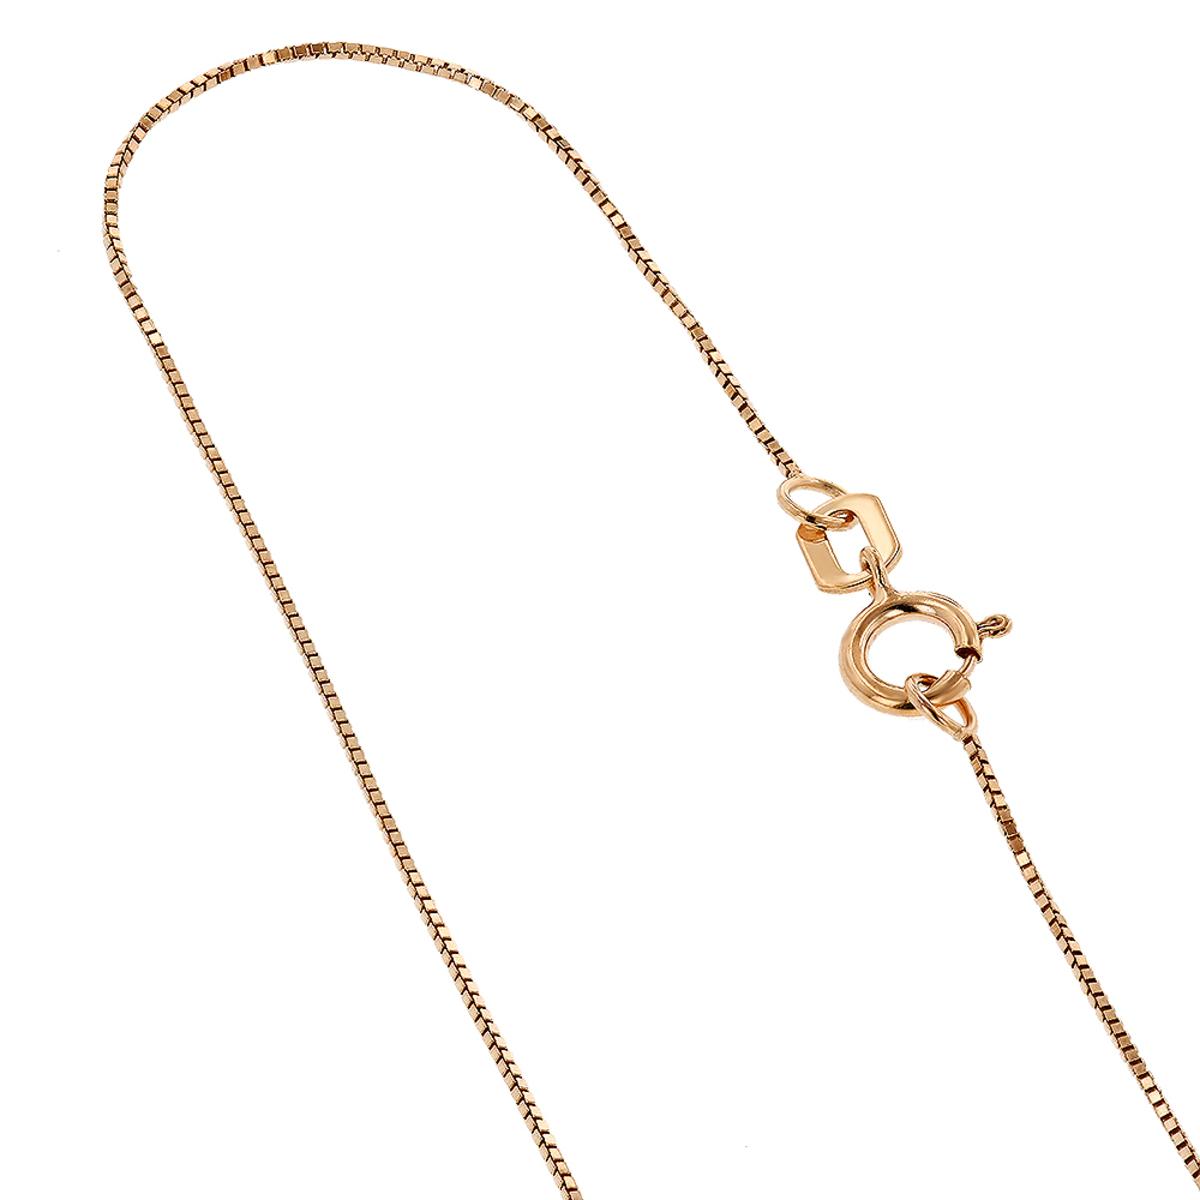 LUXURMAN Solid 14k Gold Box Chain For Women 0.6mm Wide